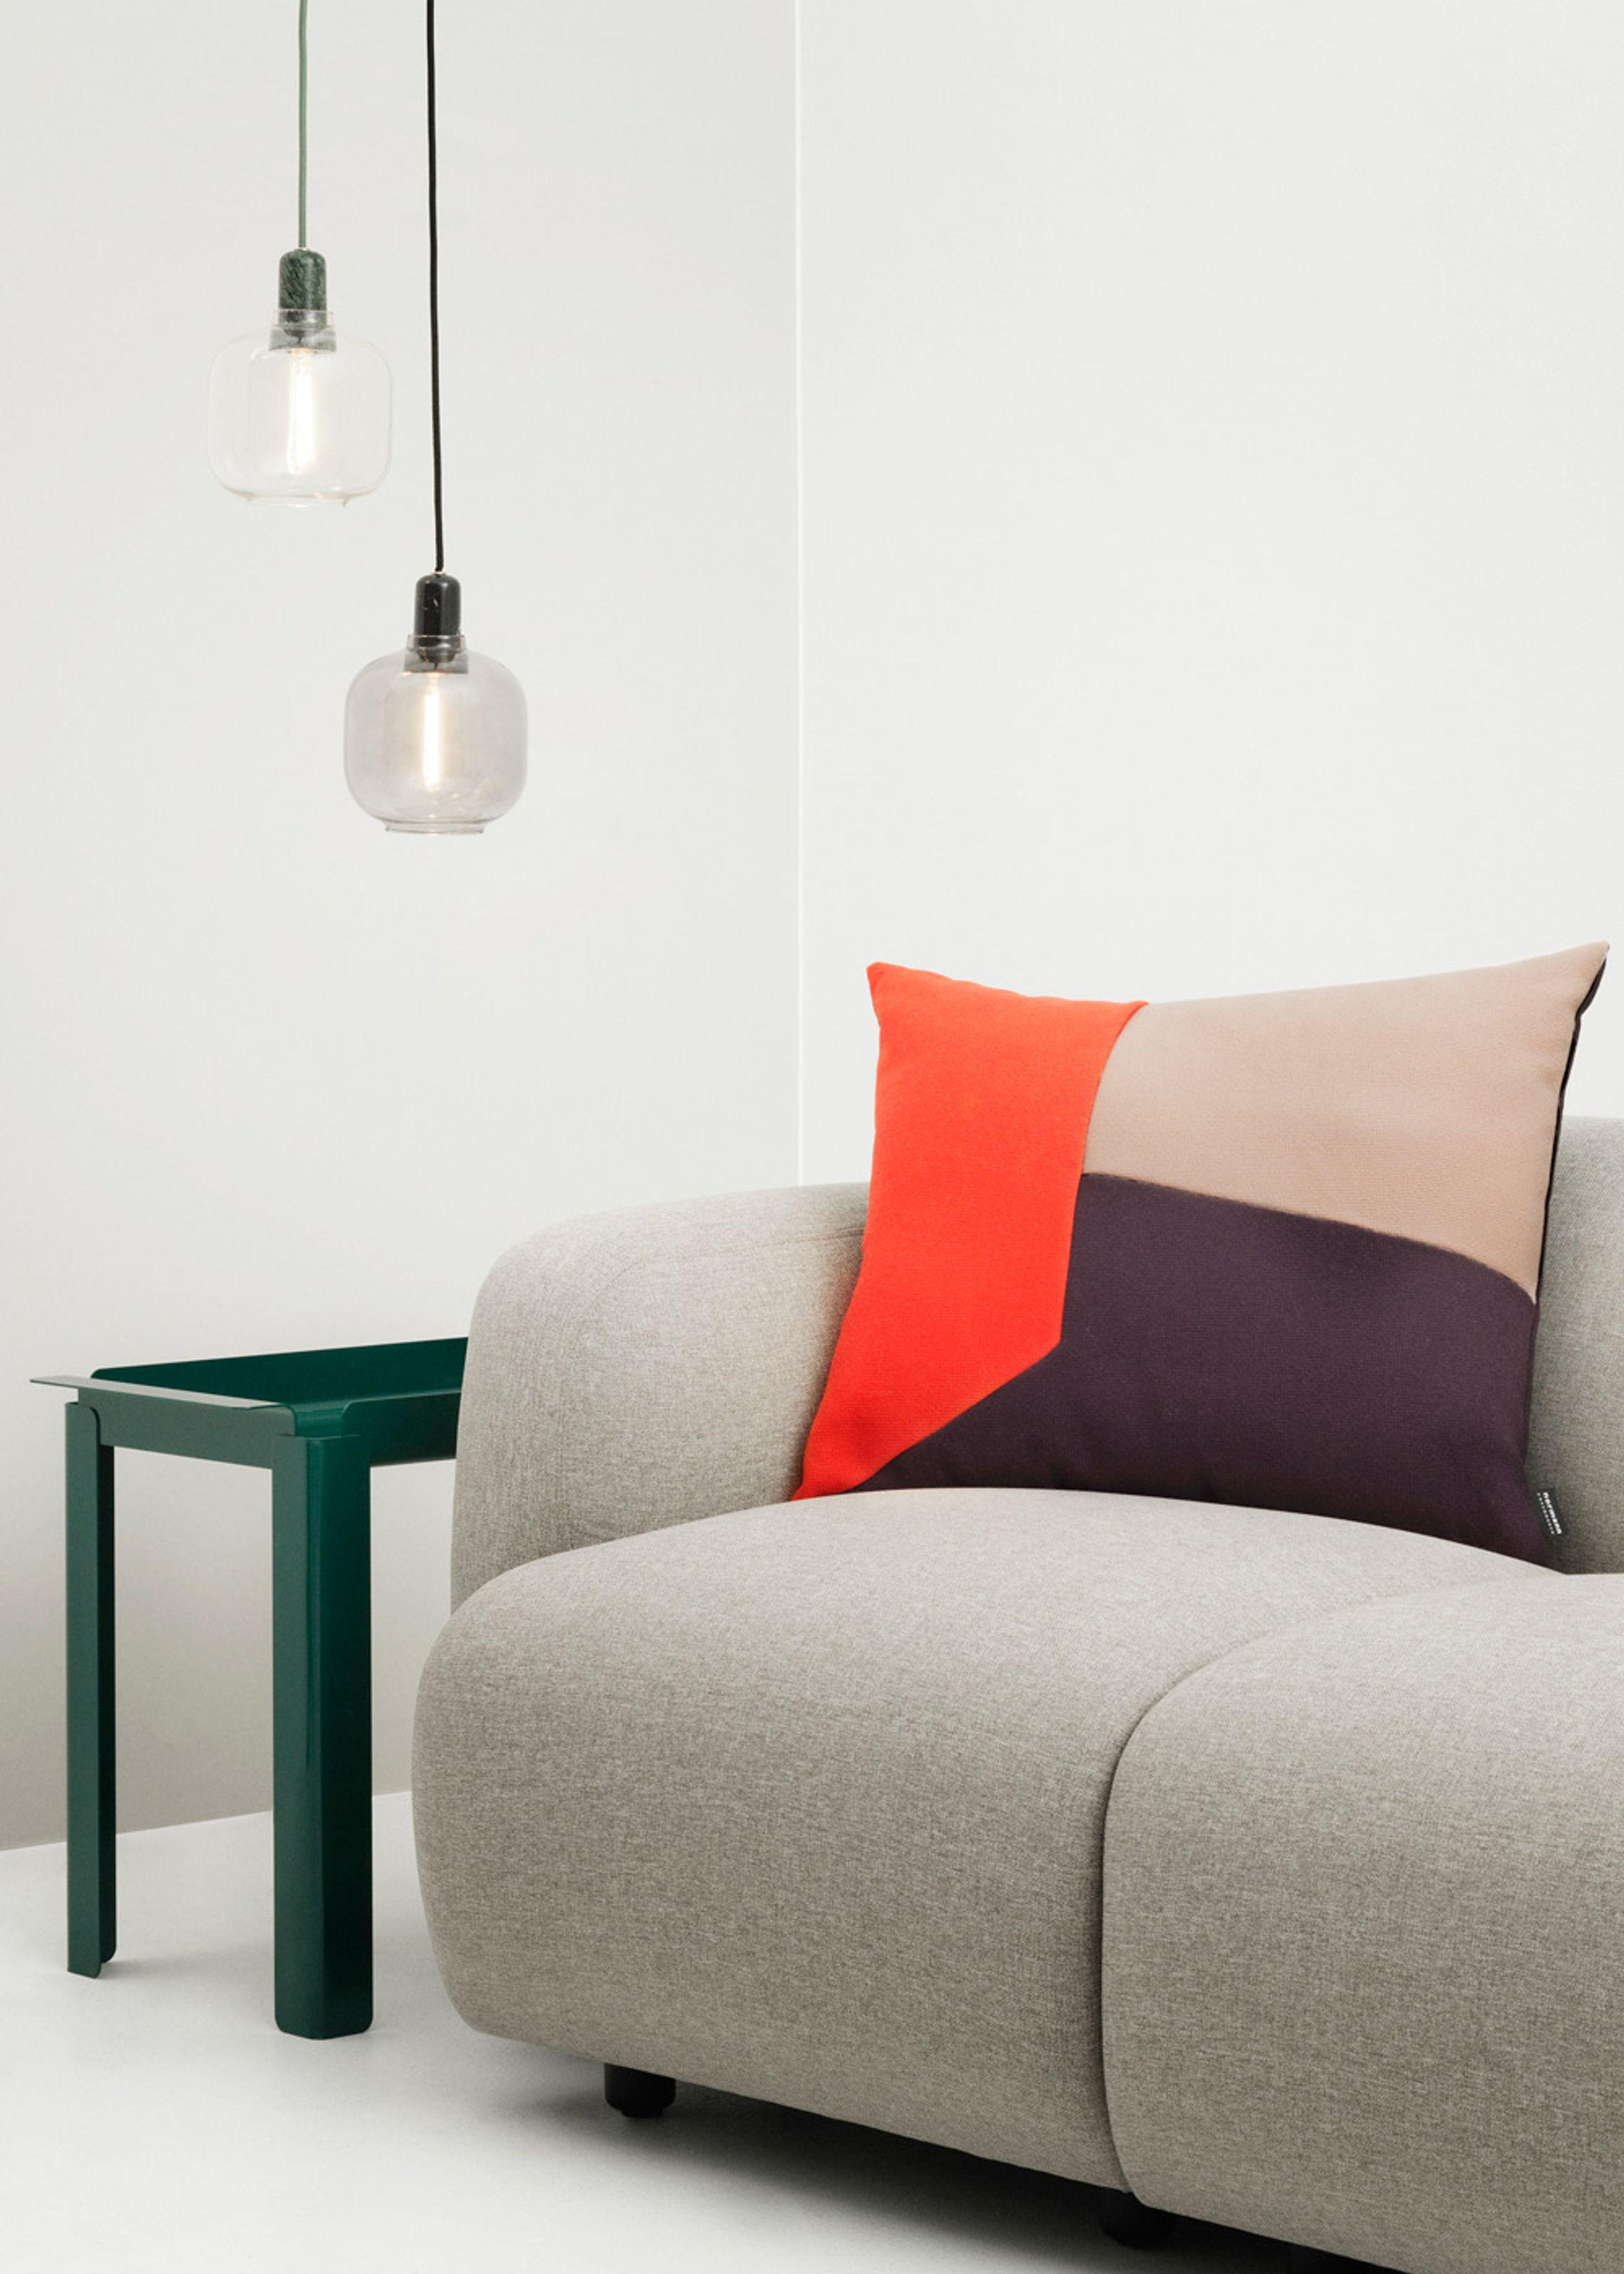 amp table lamp lampe normann copenhagen. Black Bedroom Furniture Sets. Home Design Ideas